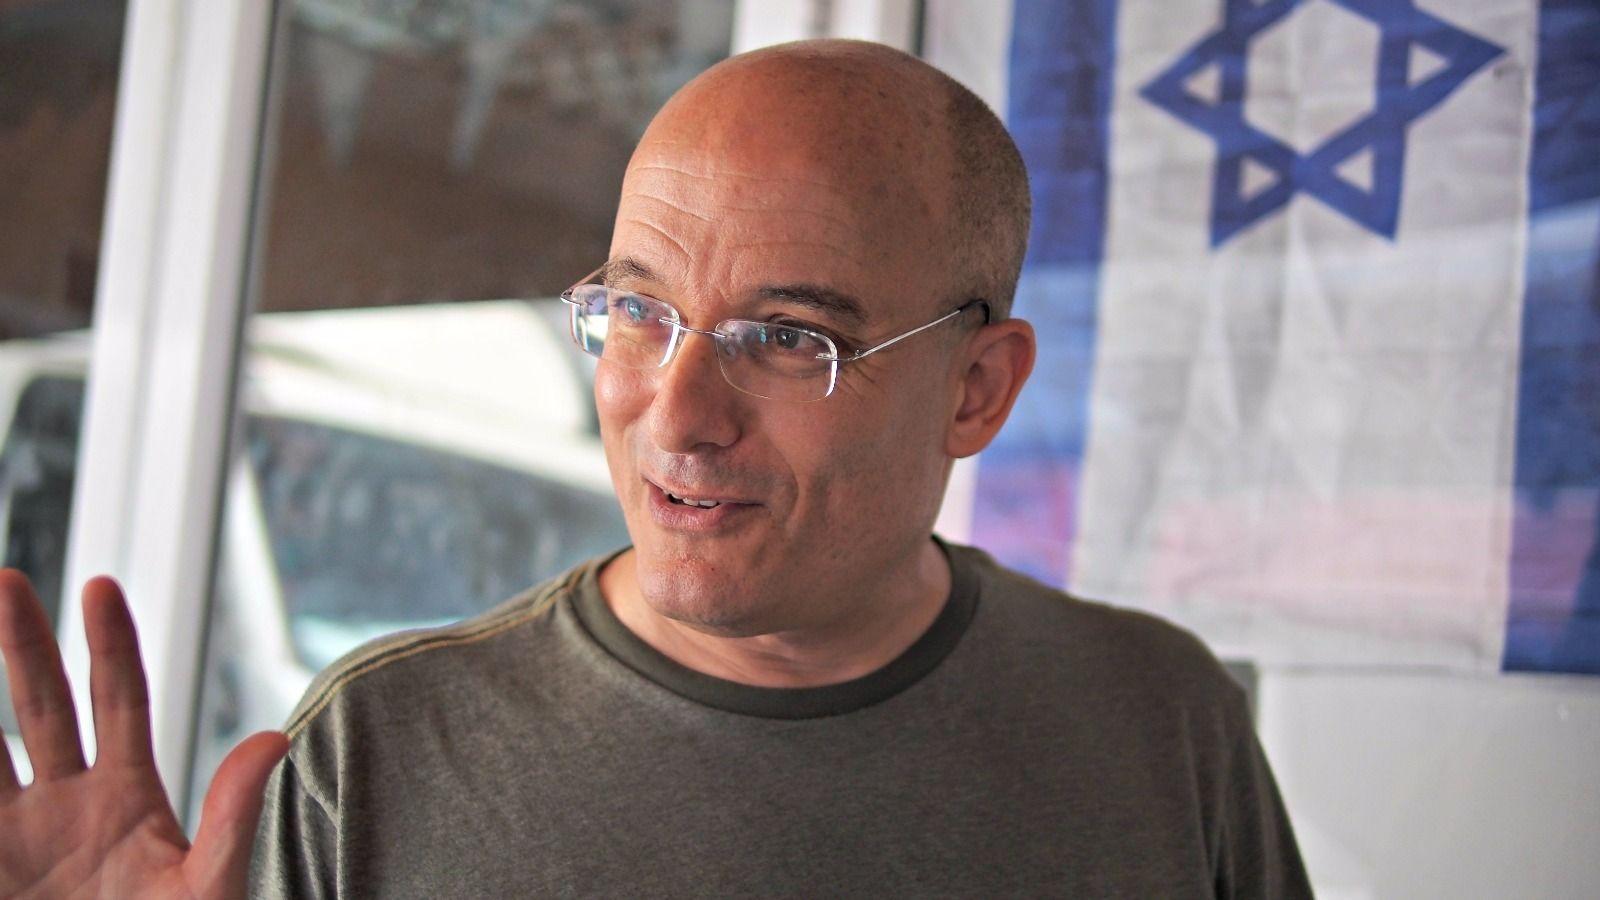 Israeli food star Gil Hovav gave our group a tour of Levinsky Market.